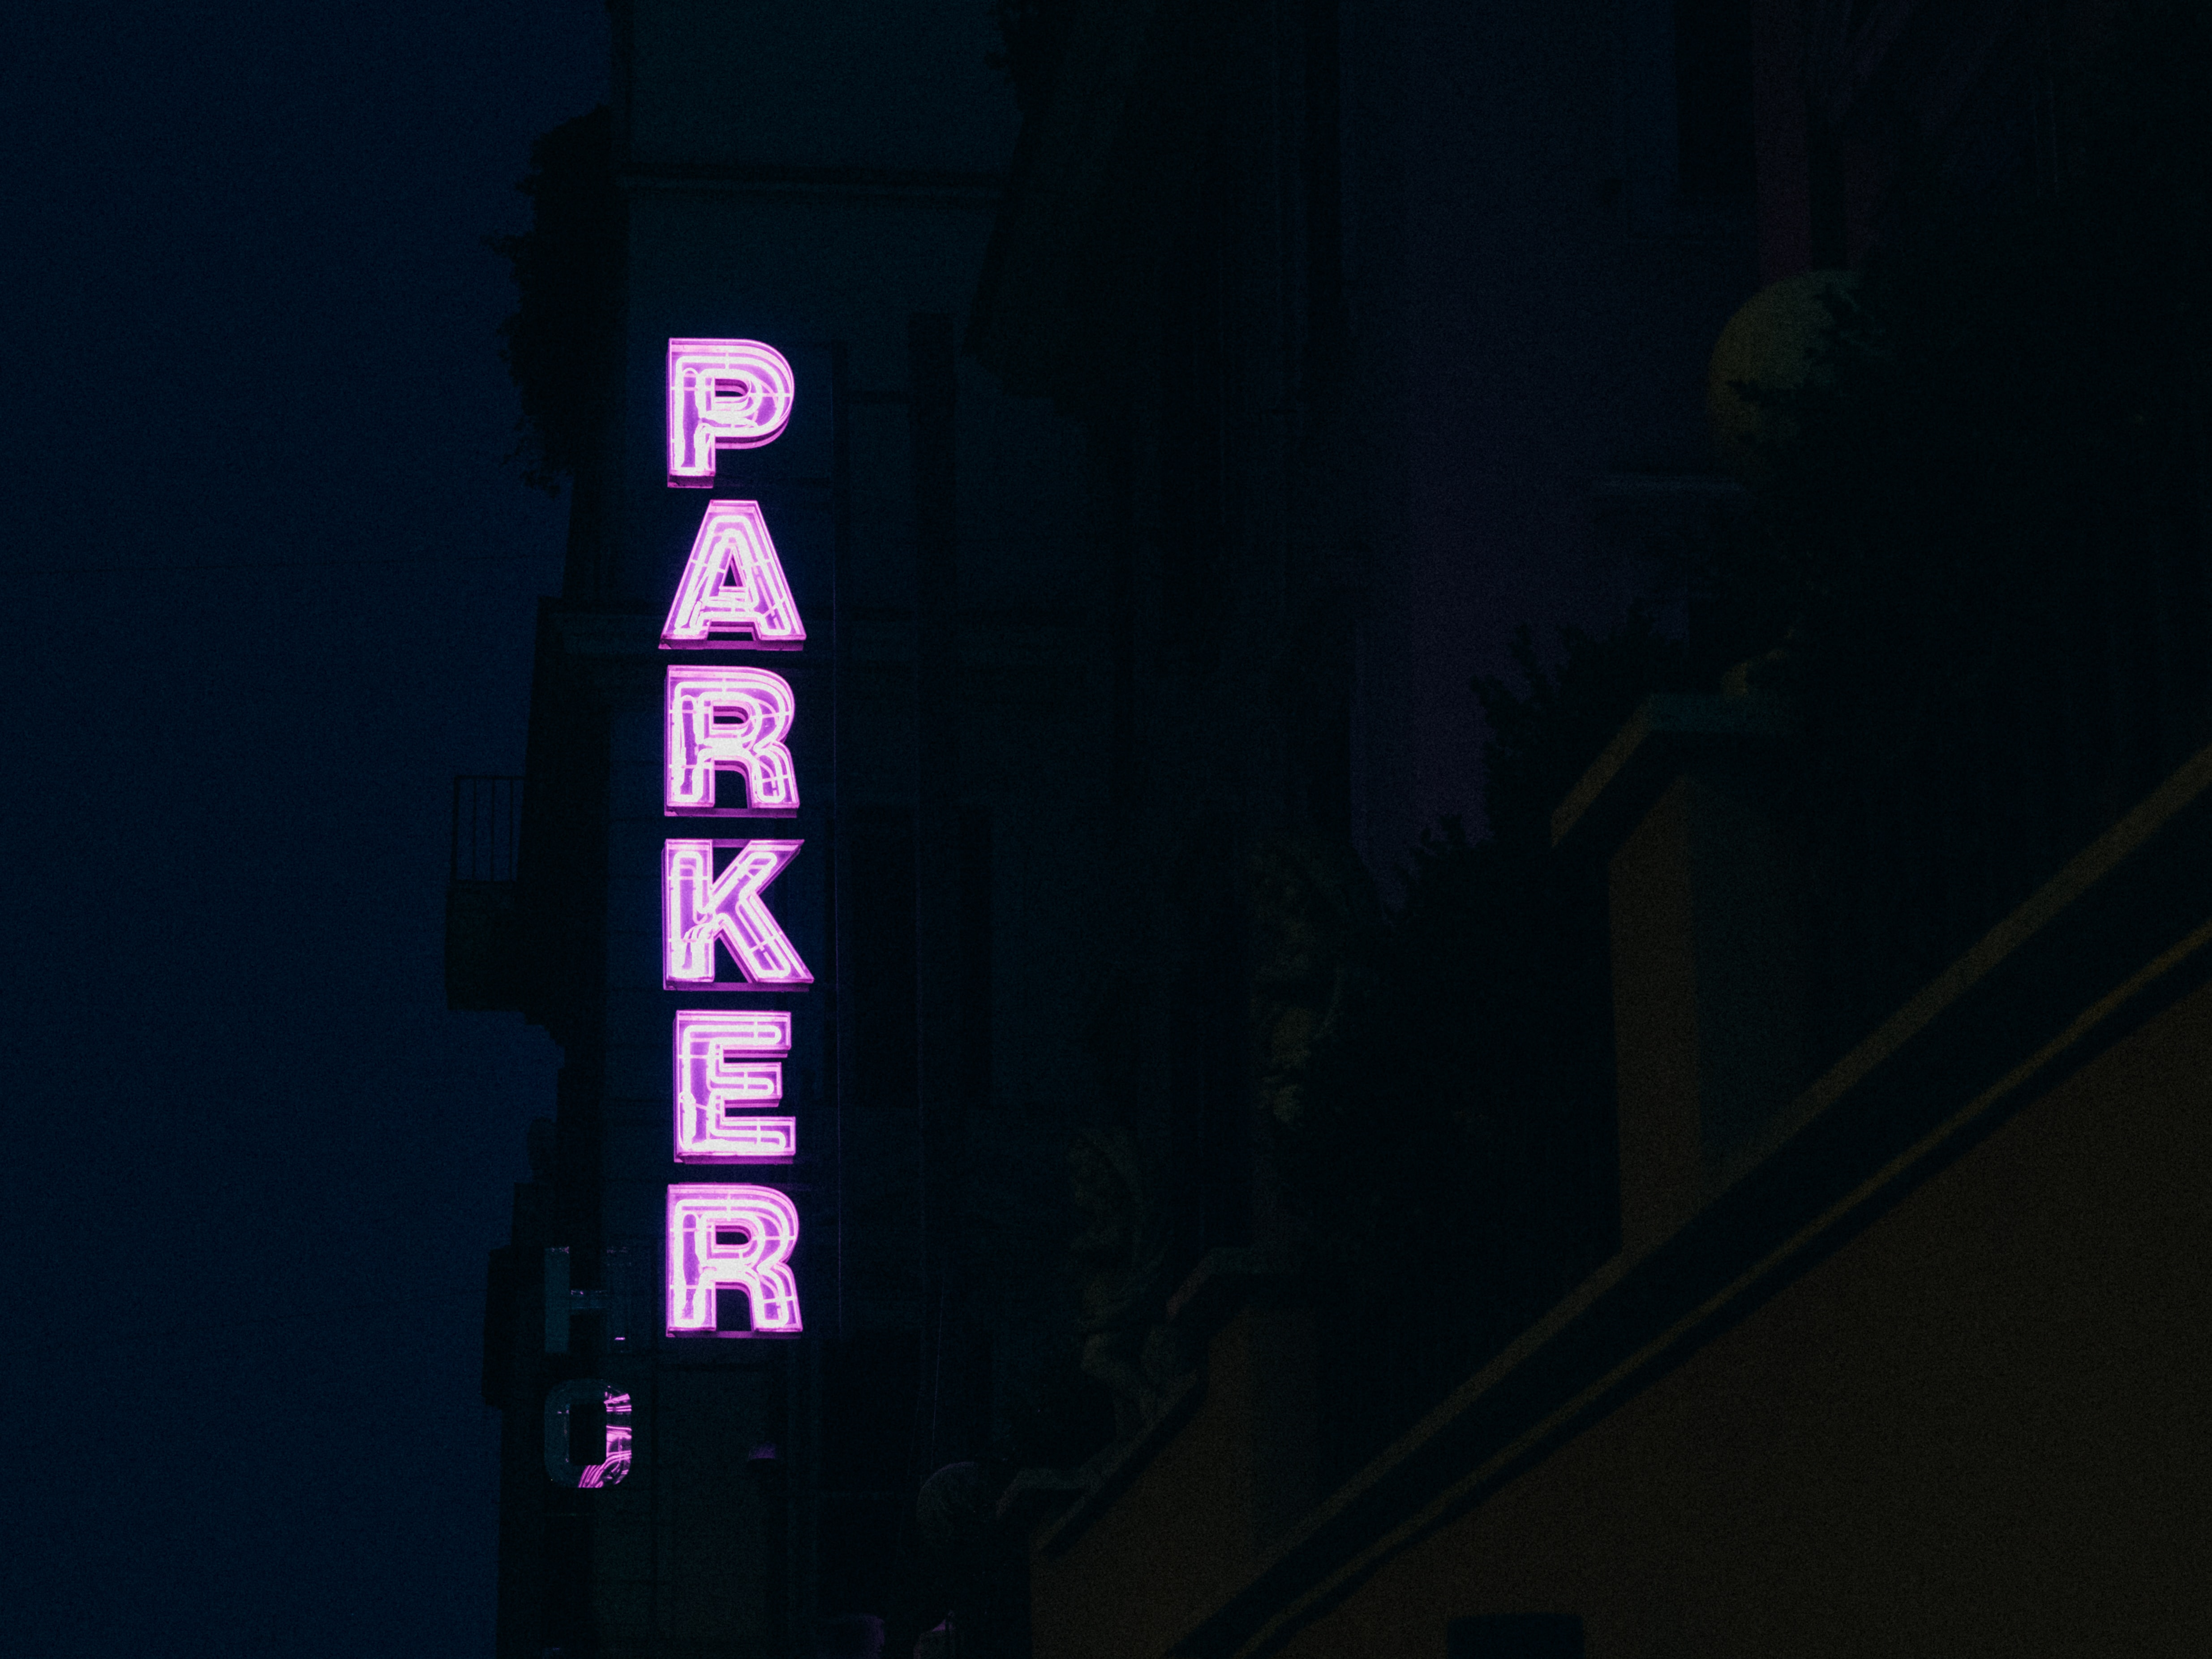 lit Parker neon light signage on a side of a building